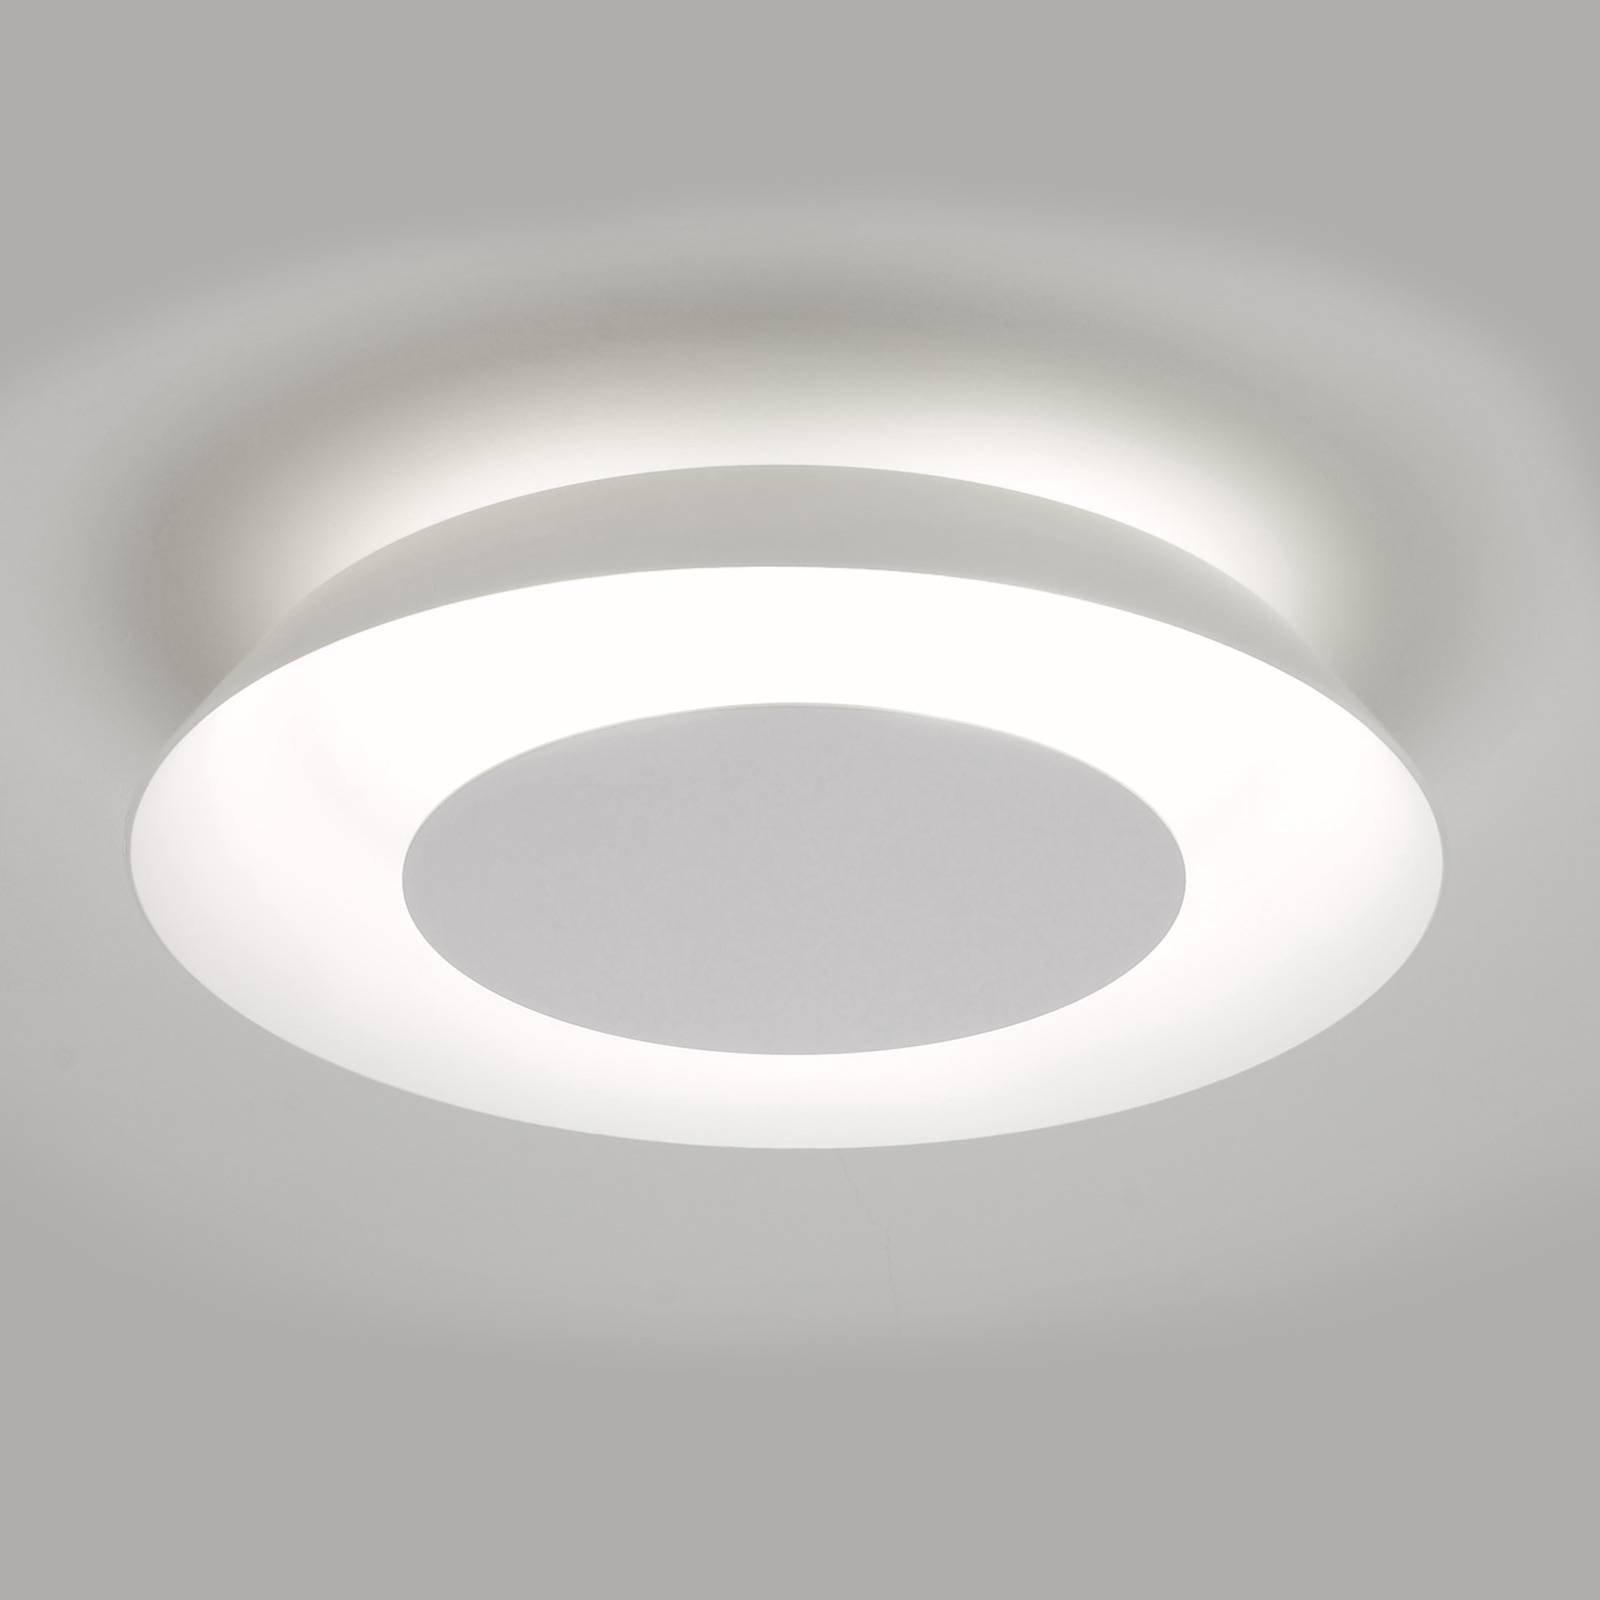 Casablanca Torno LED-taklampe Ø 40 cm